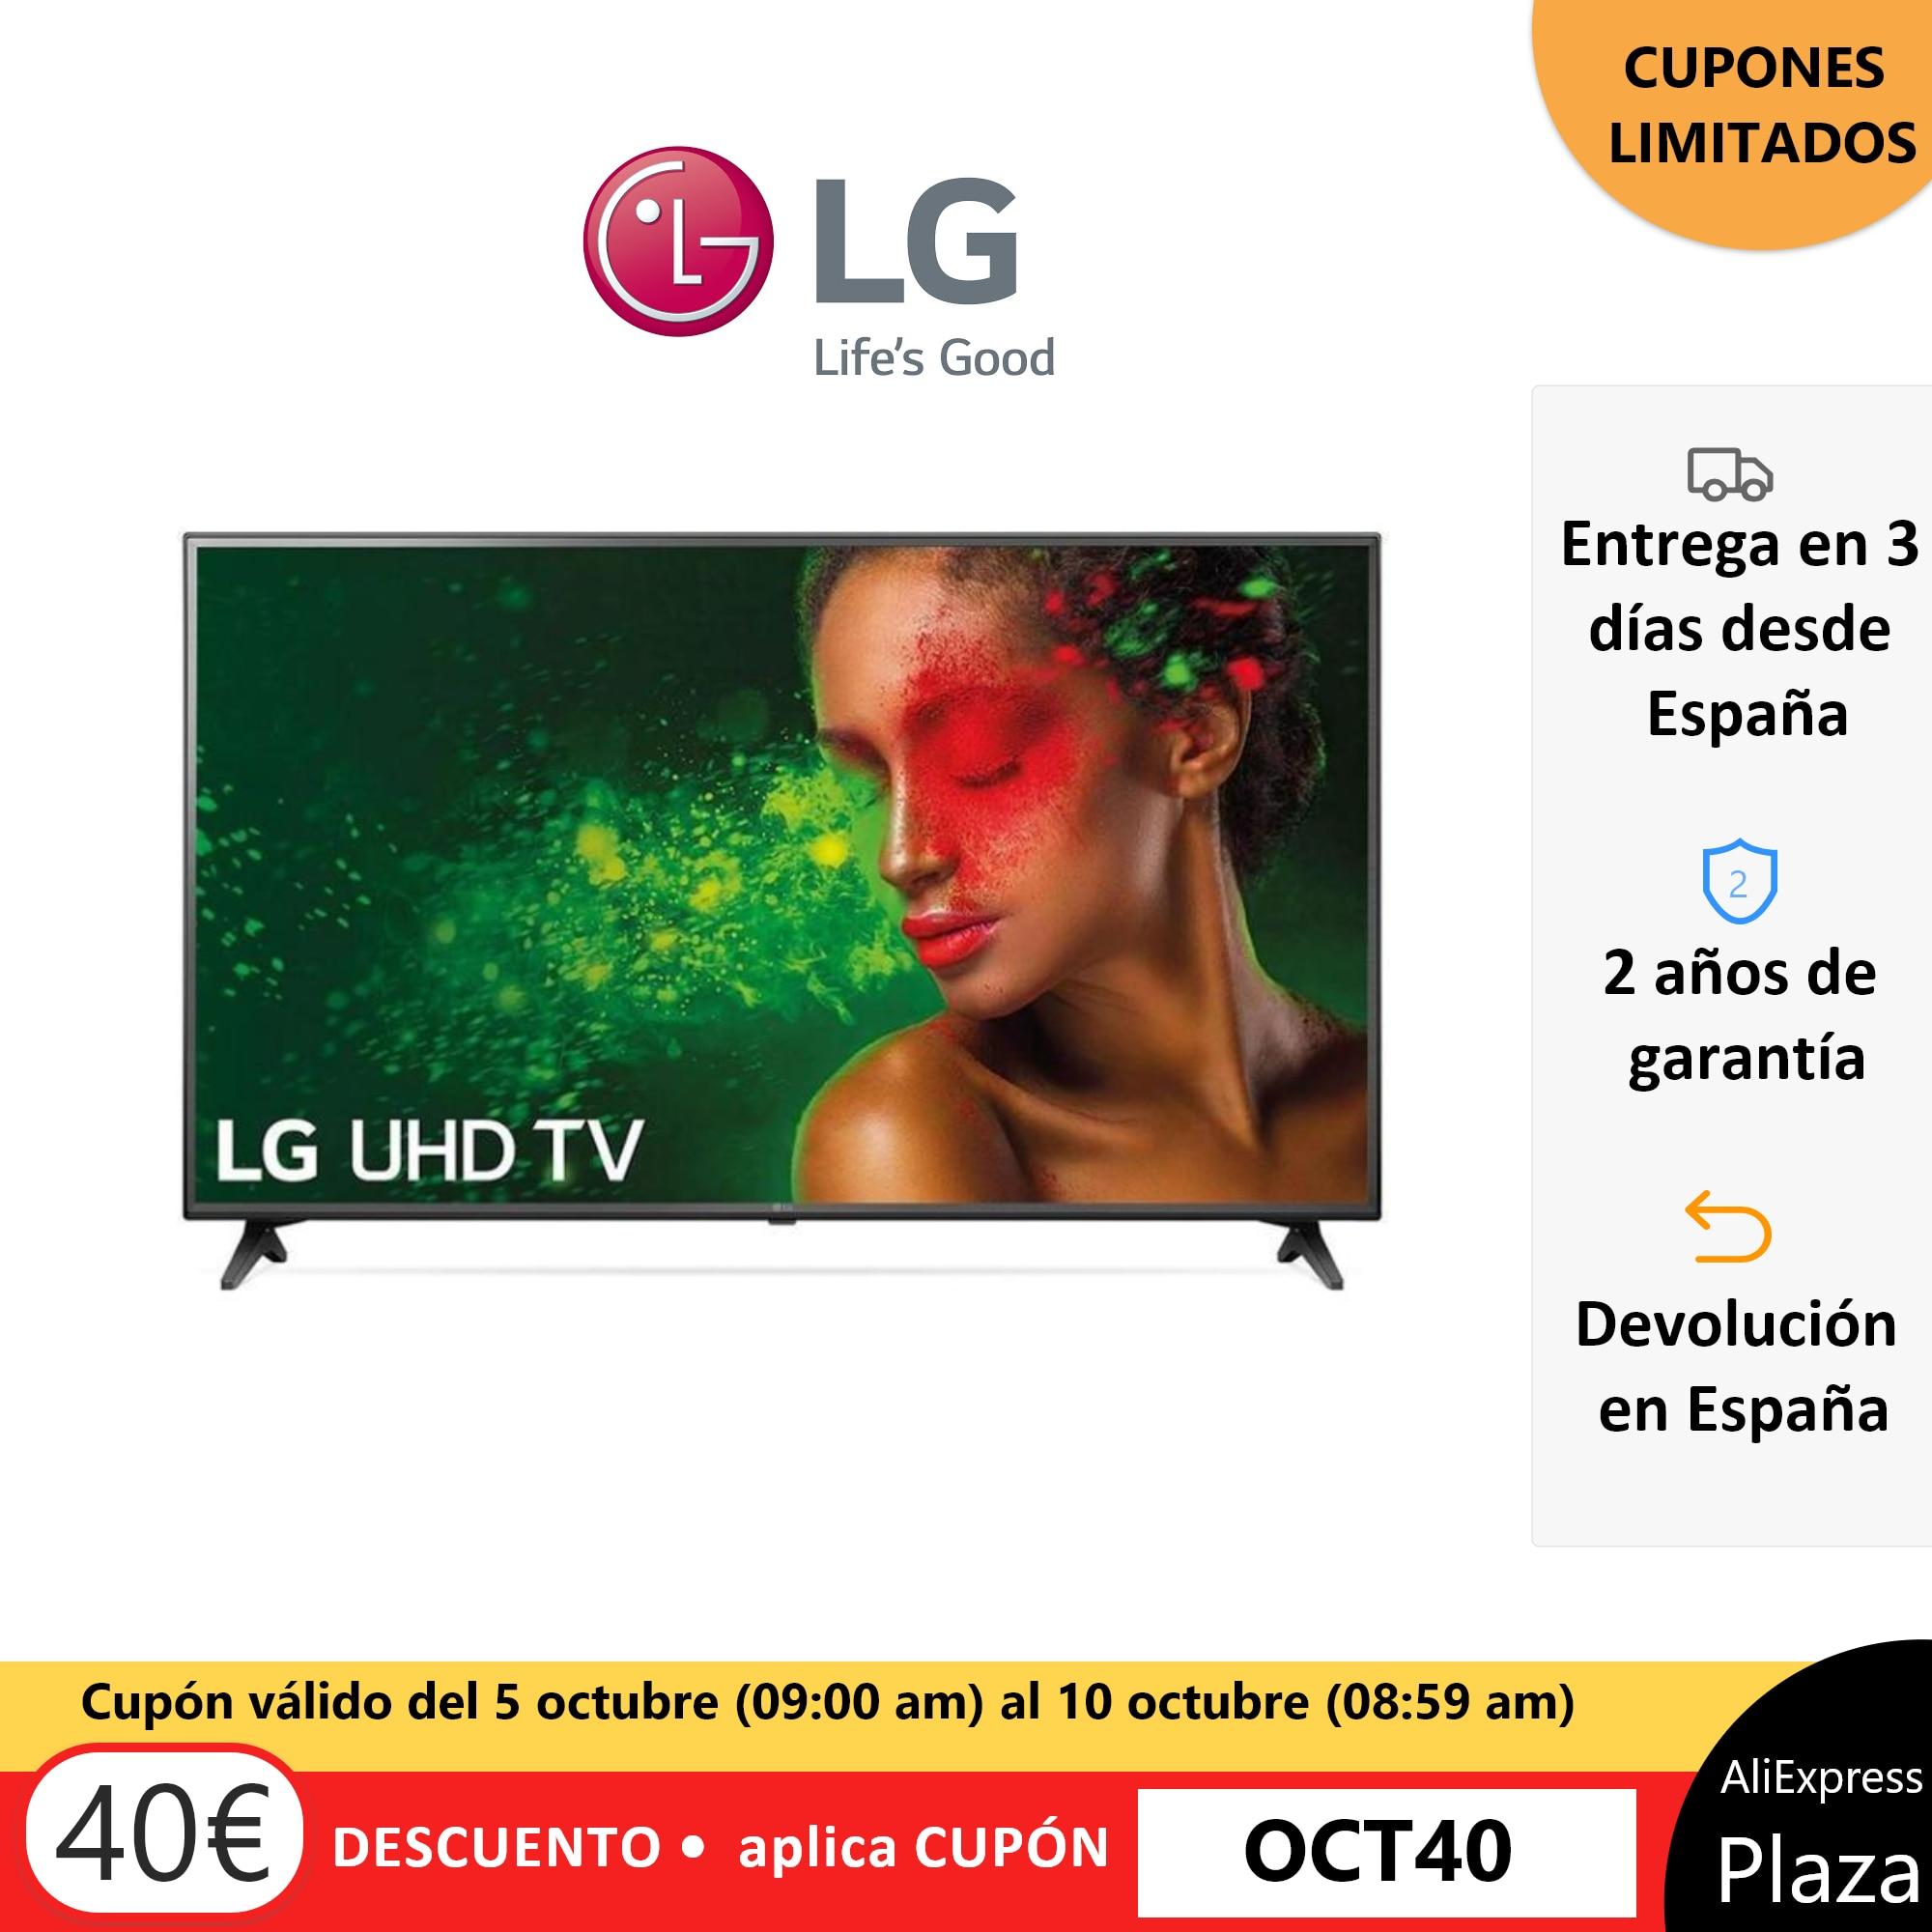 Televisor LG TV 55 UM7000PL UHD 4K Smart TV Procesador Quad Core, Sonido ULTRA Surround Plaza España